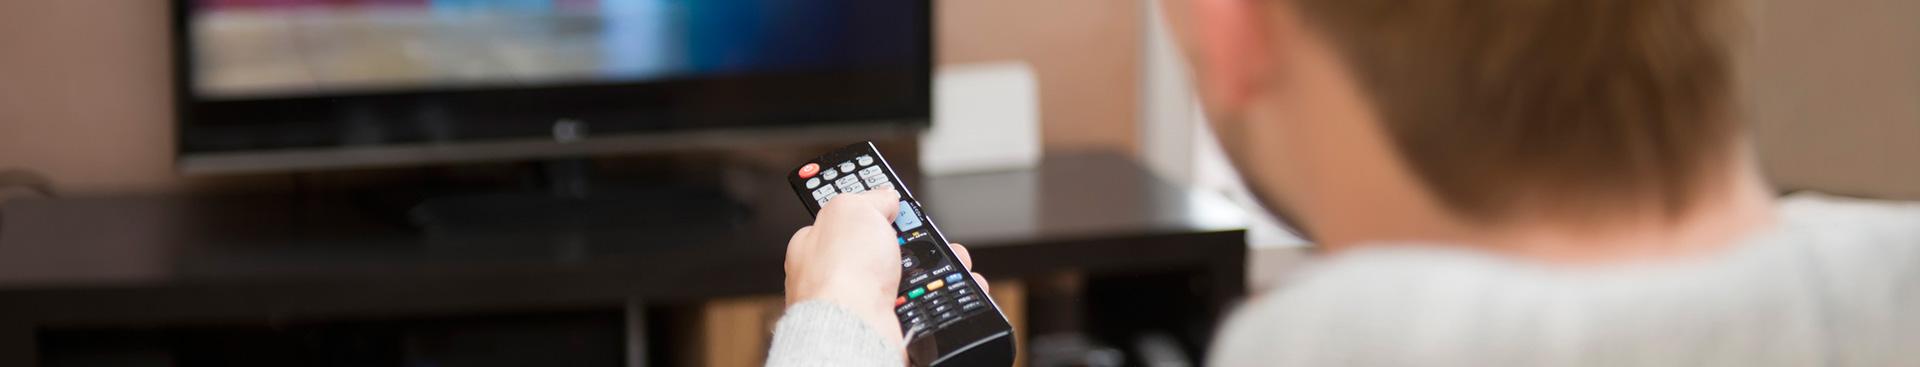 TV AND RADIO PROGRAMMES